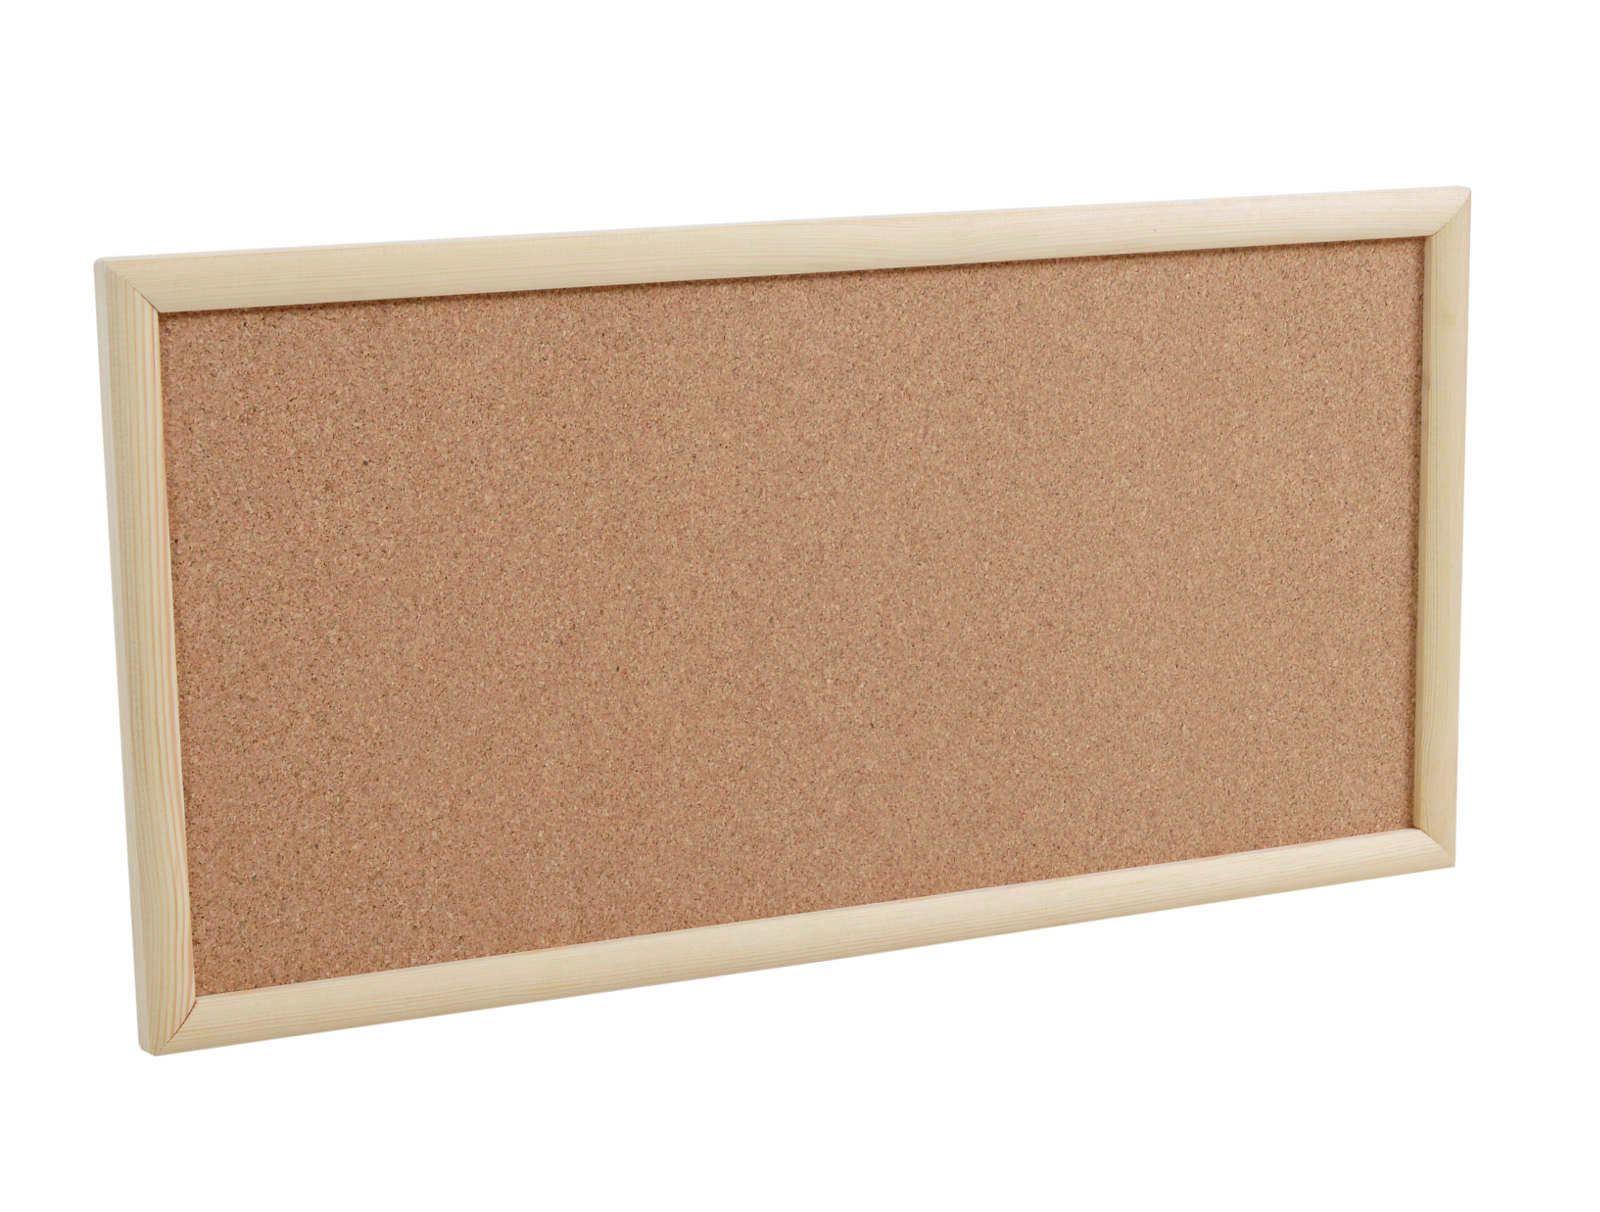 Design bois bureau tissu exotique exterieur scandi ampm tissus